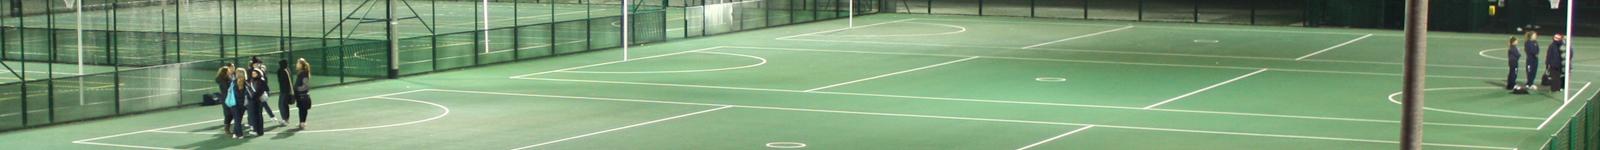 brighton netball